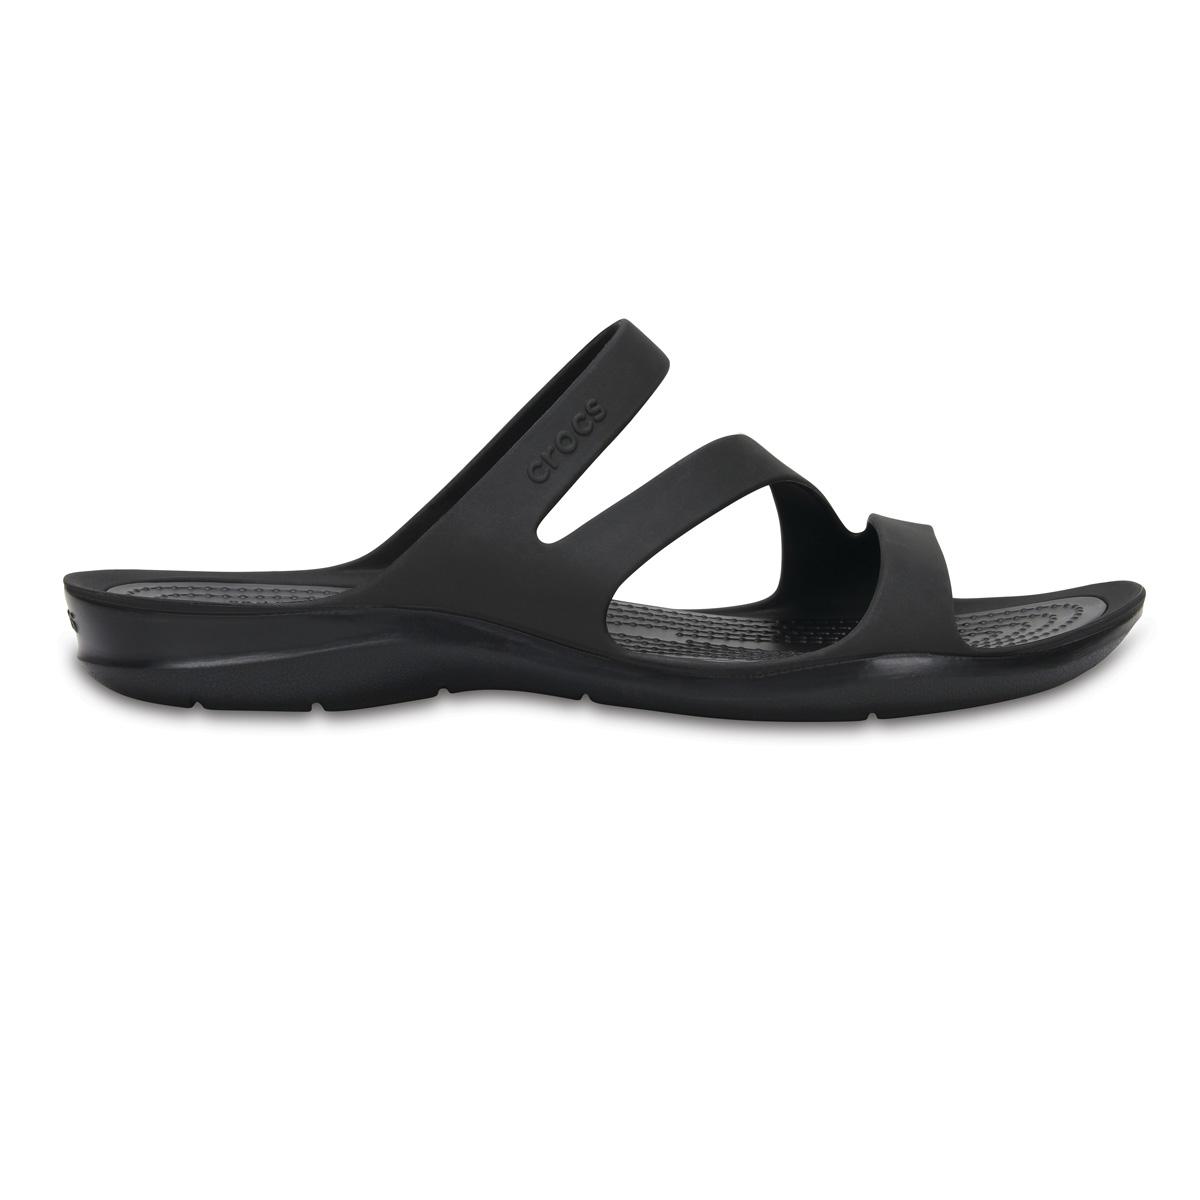 Crocs Swiftwater Sandal W - Siyah/Siyah